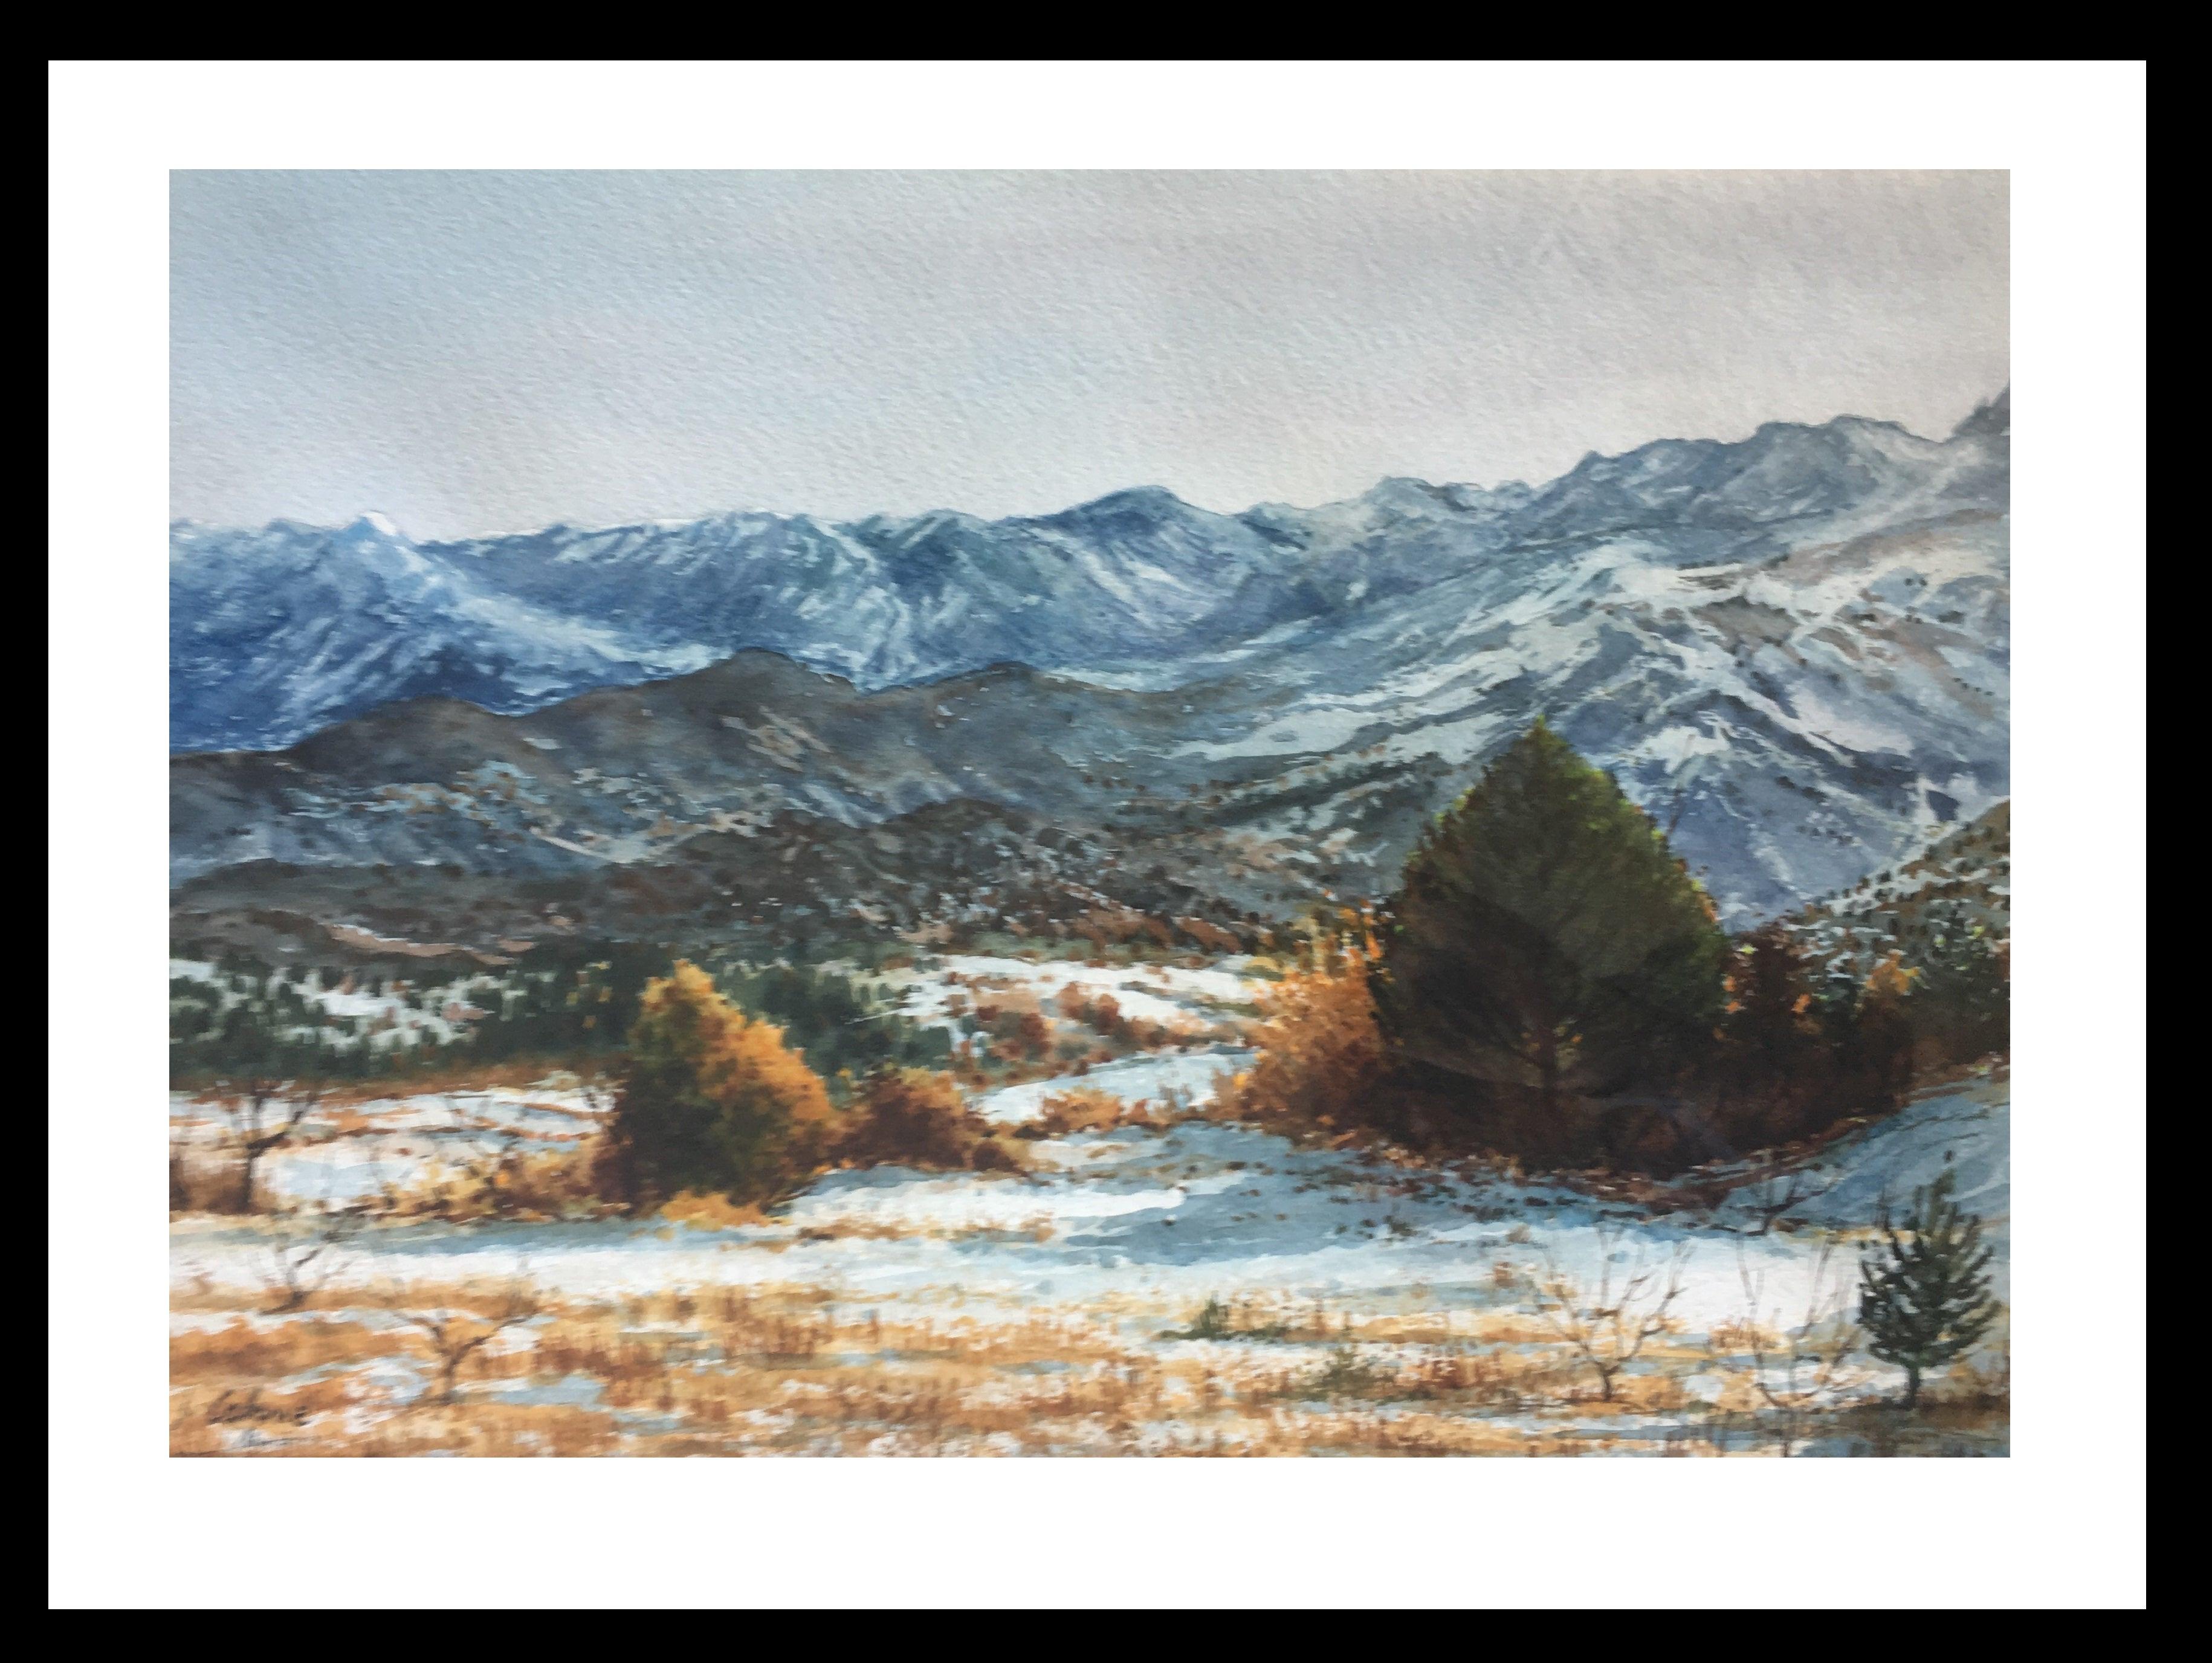 Landscape Pyrenees original realist watercolor painting